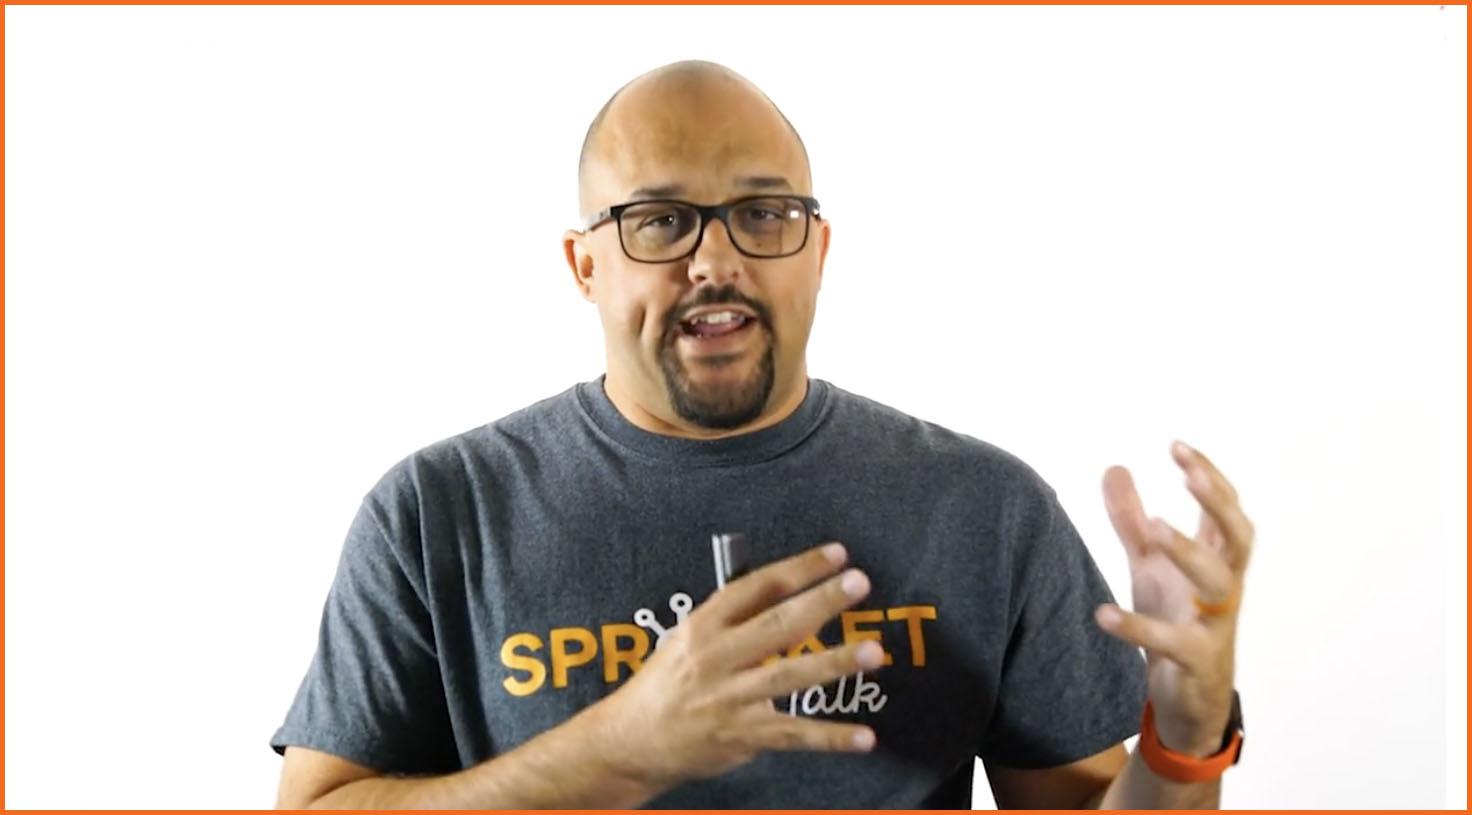 Sprocket Talk - Coiurse